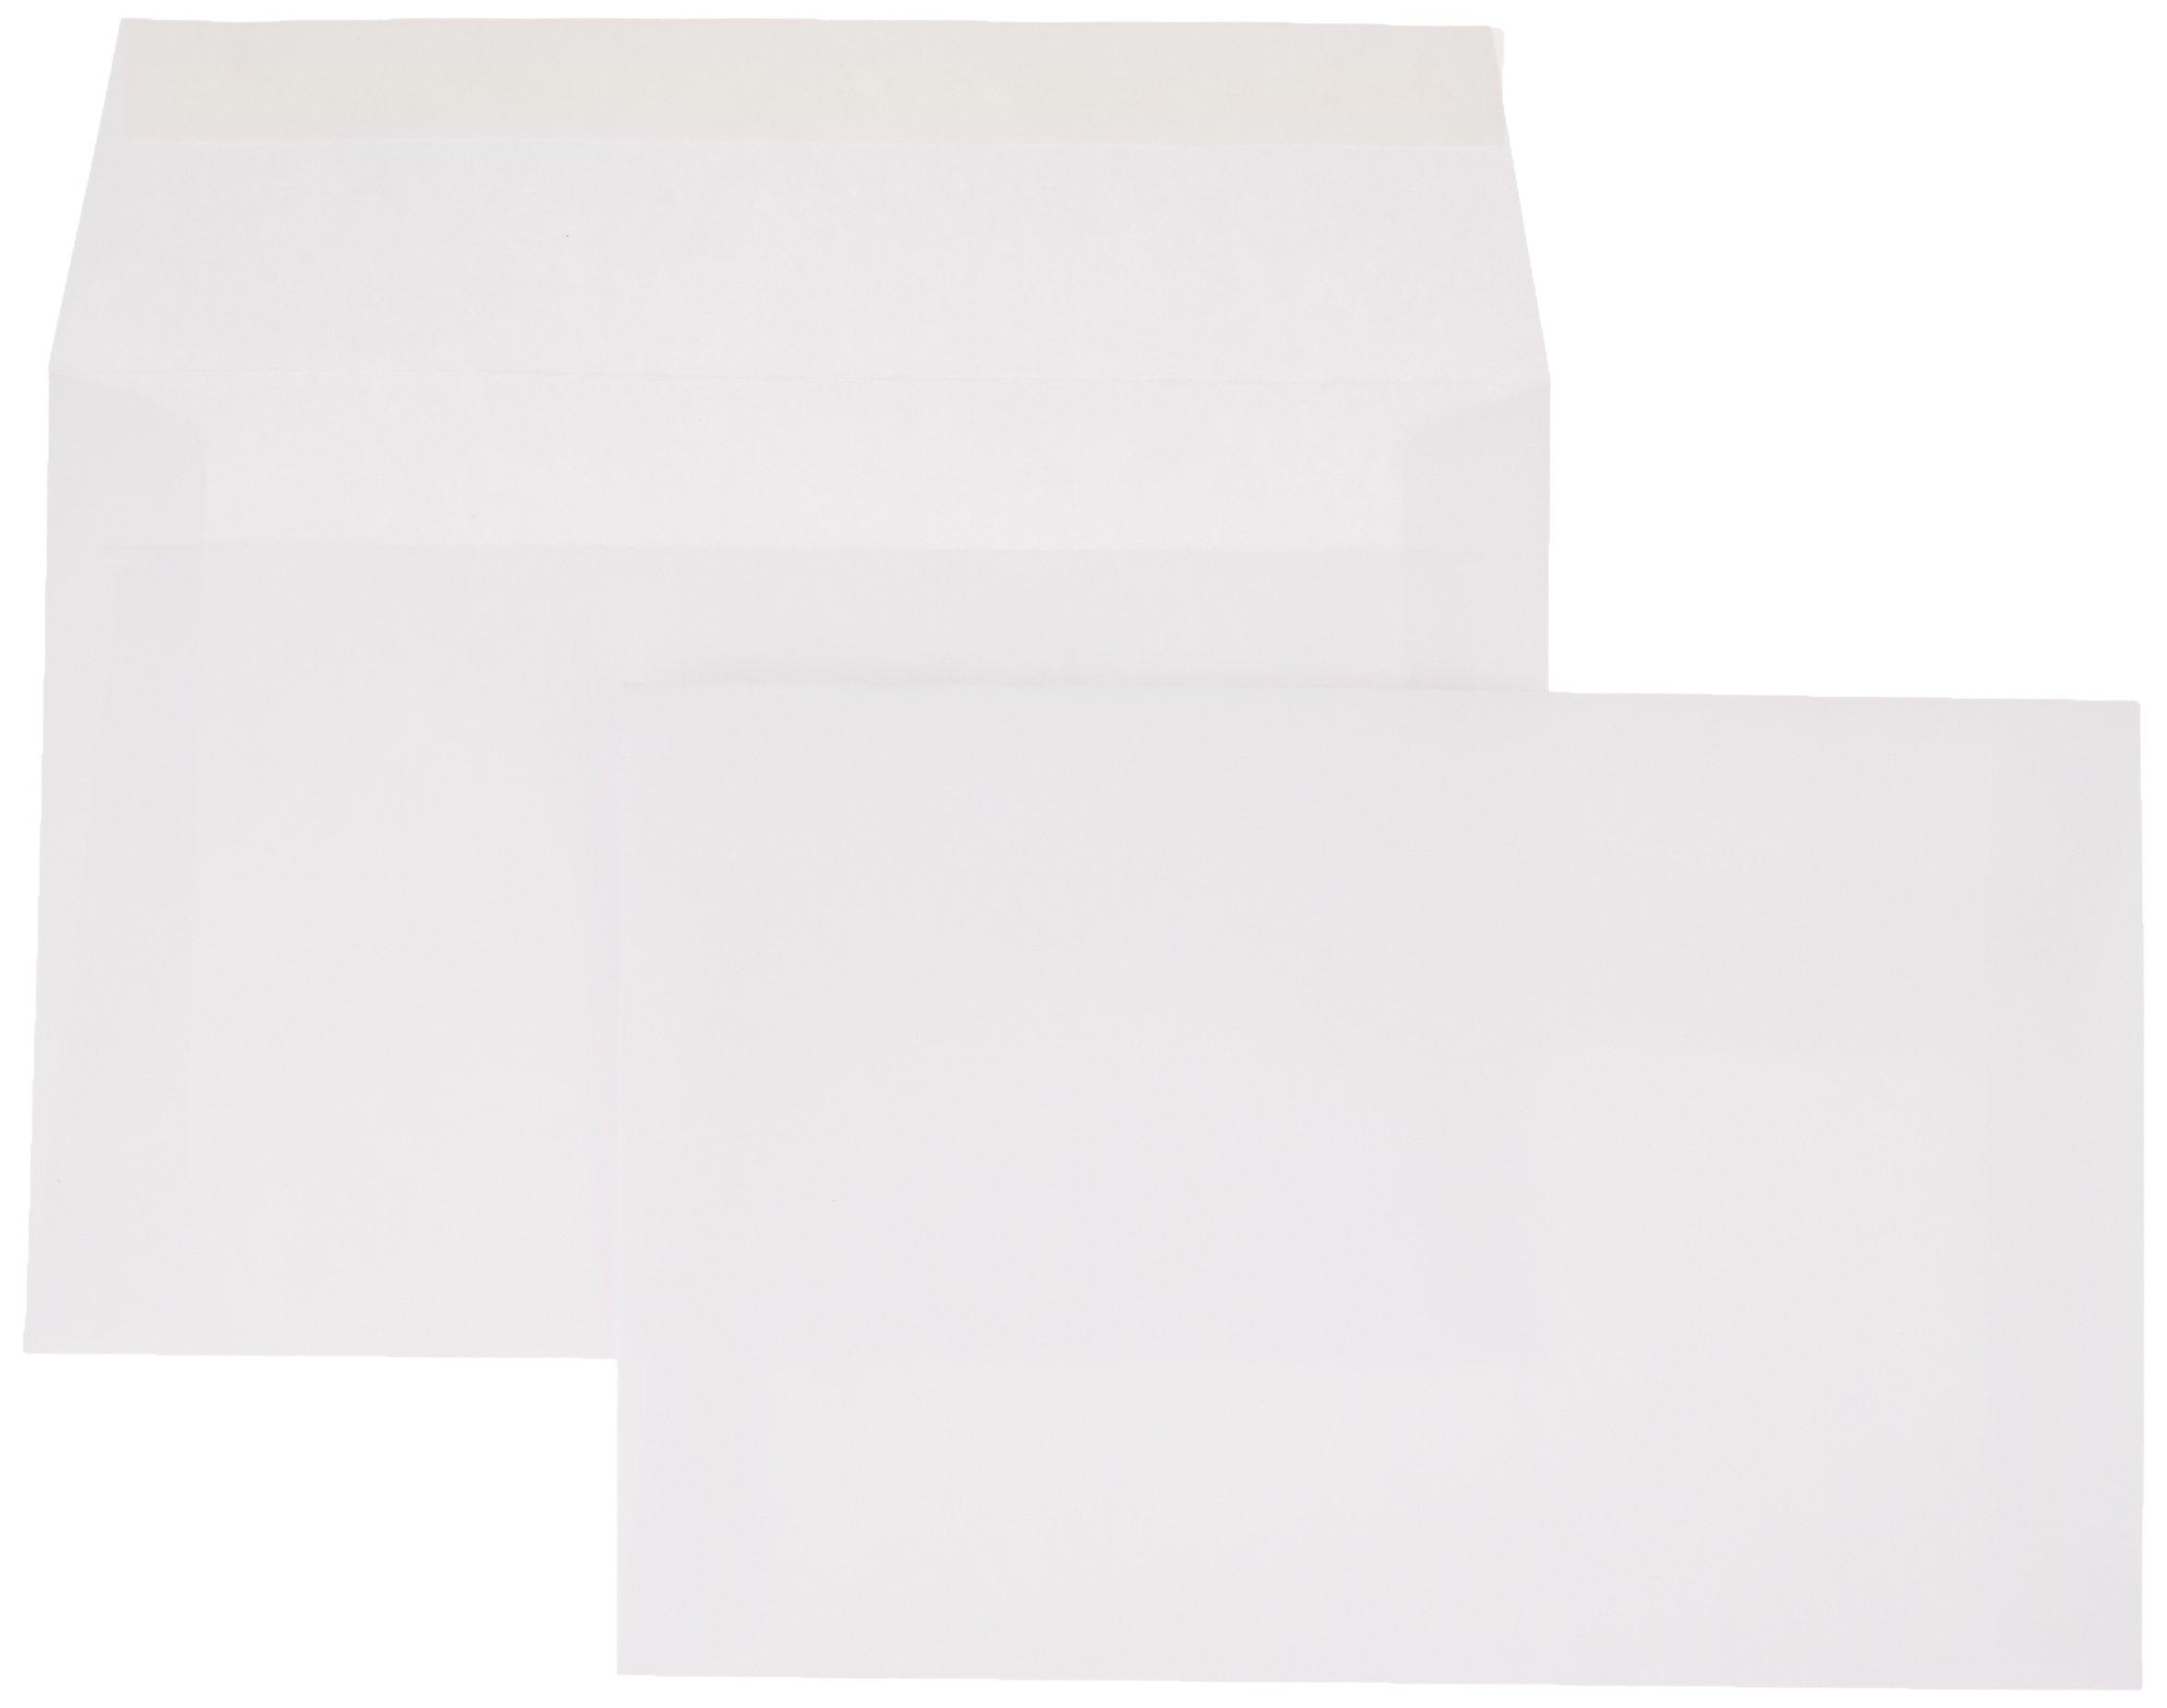 AmazonBasics A9 Invitation Envelope, Peel & Seal, White, 100-Pack (5-3/4 x 8-3/4 inches)